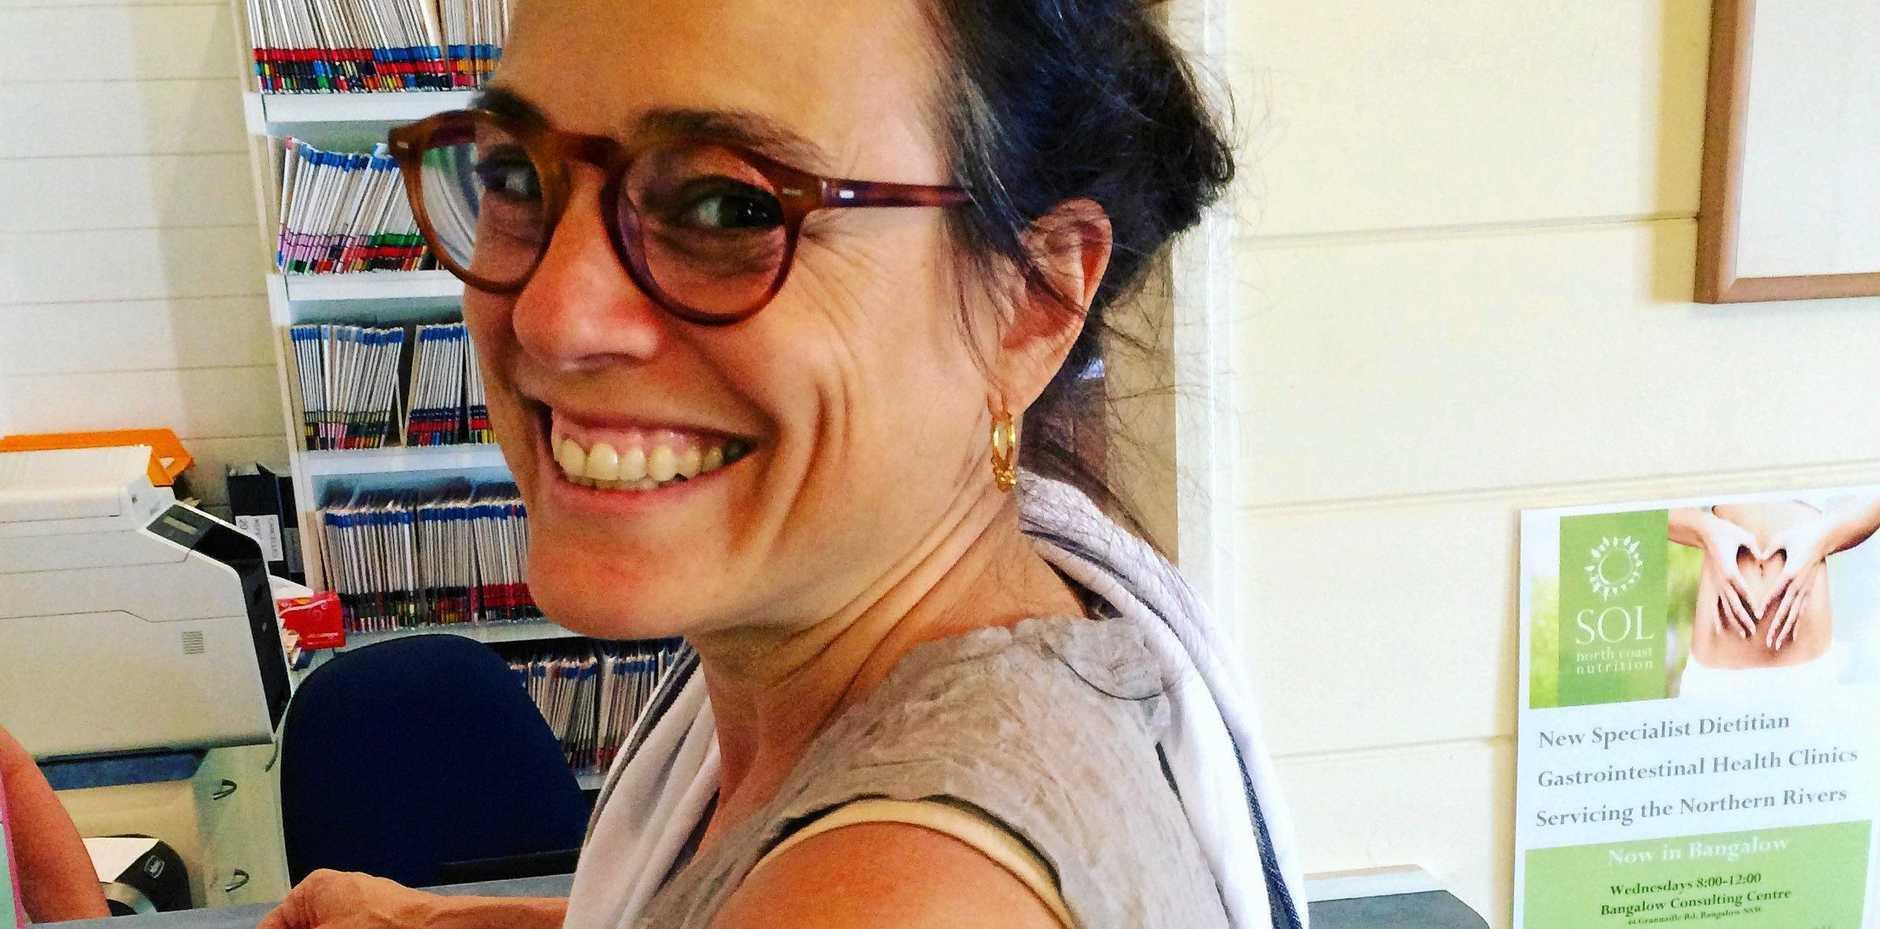 LIFE SAVING: Type 1 diabetic Rachel Zinman wearing her flash glucose monitoring sensor.